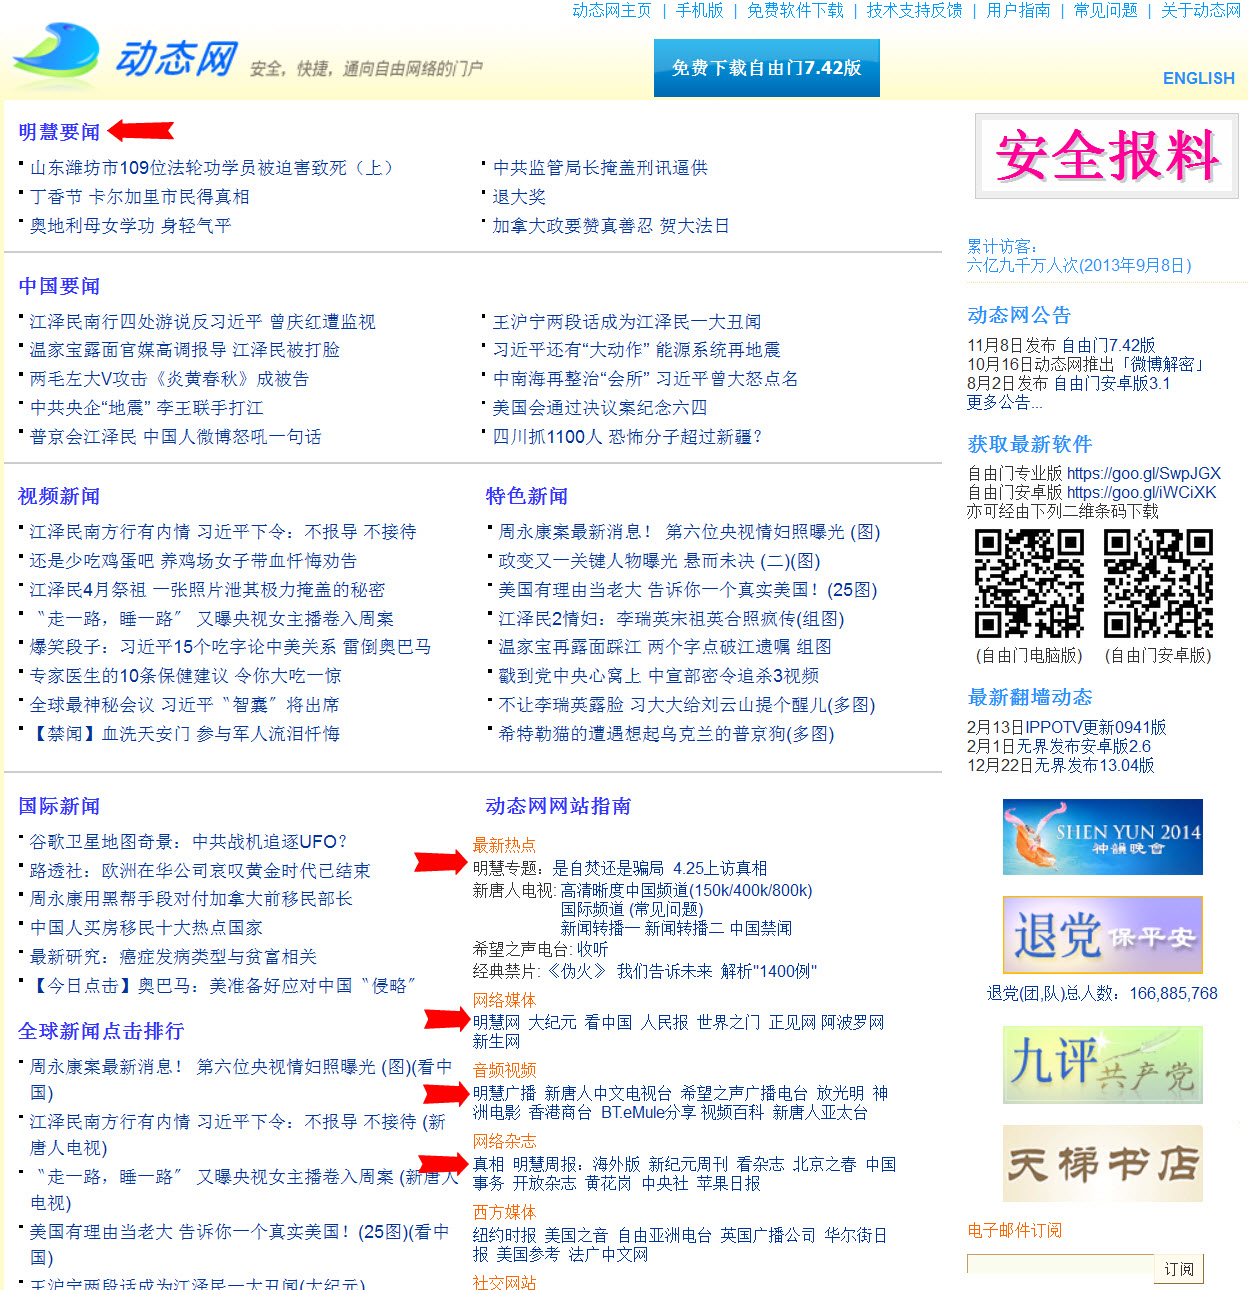 Ŋ¨æ€ç½'调整版面突出明慧信息 ƘŽæ…§ç½' The site owner hides the web page description. 明慧网